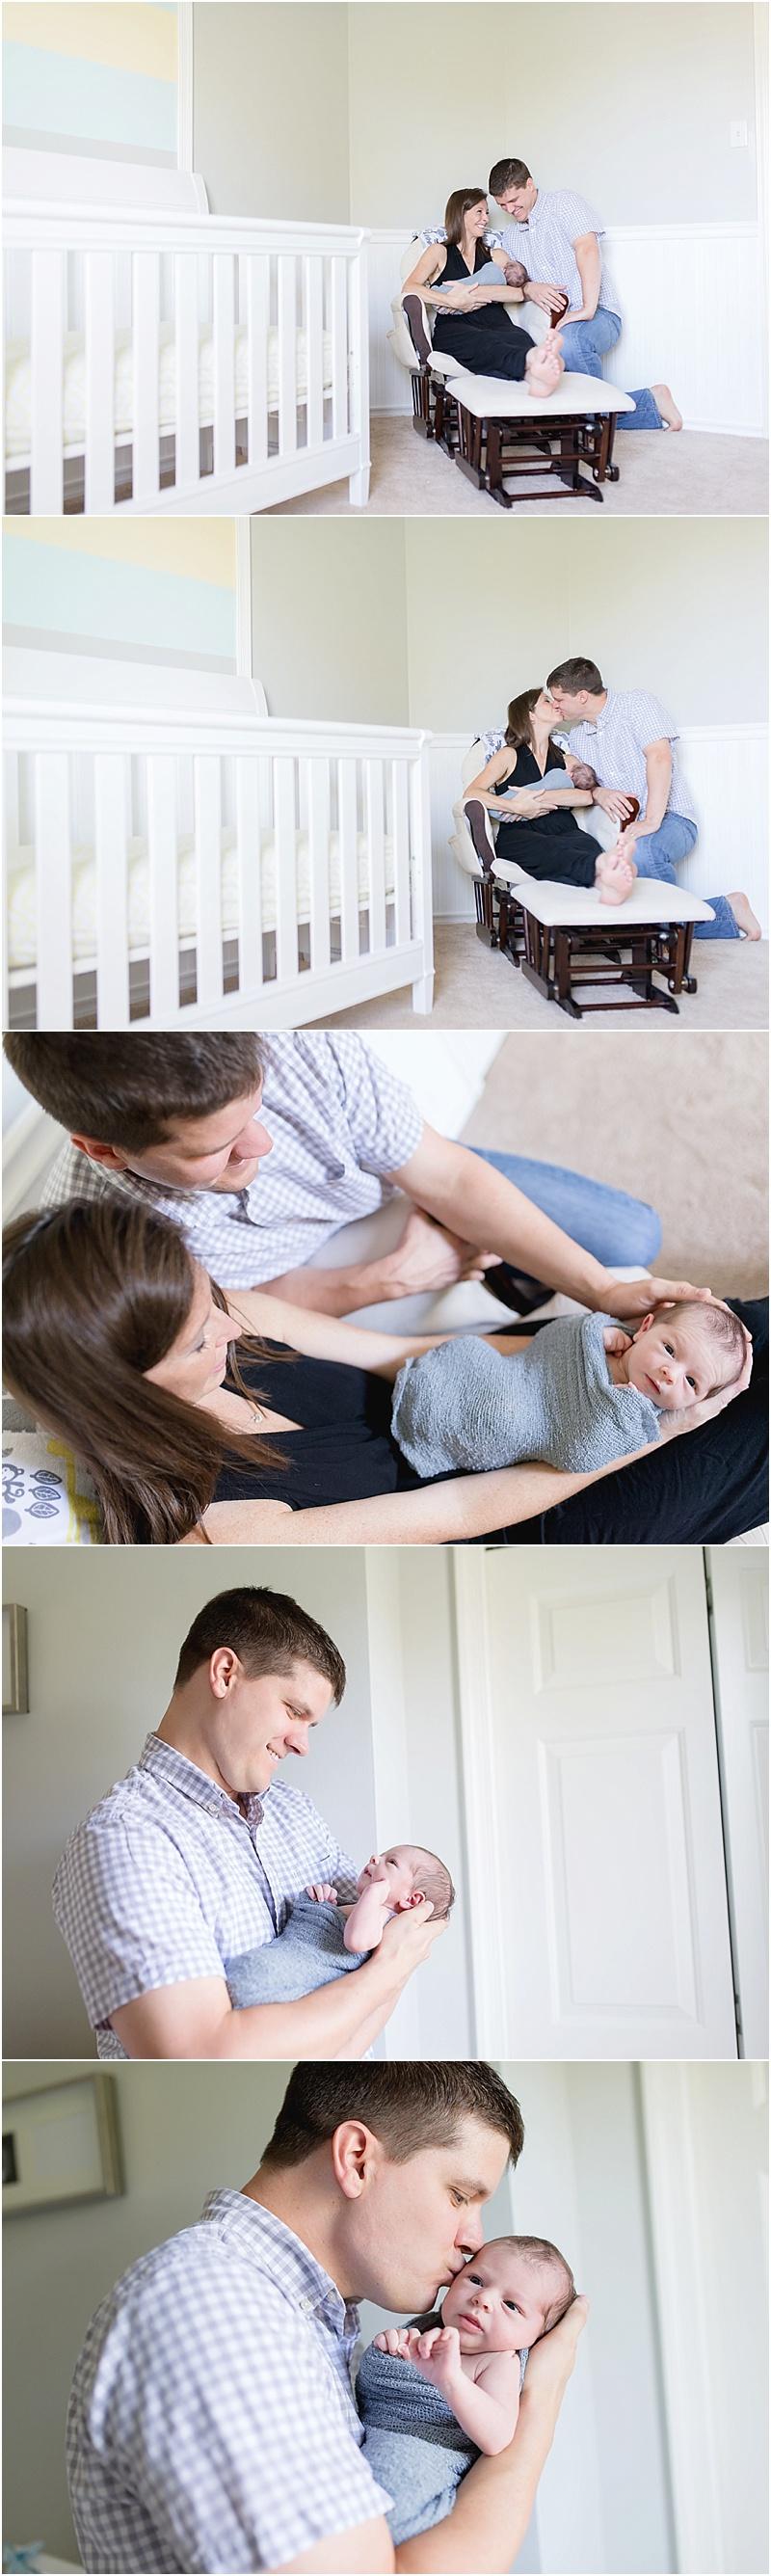 cunha newborn-8.jpg